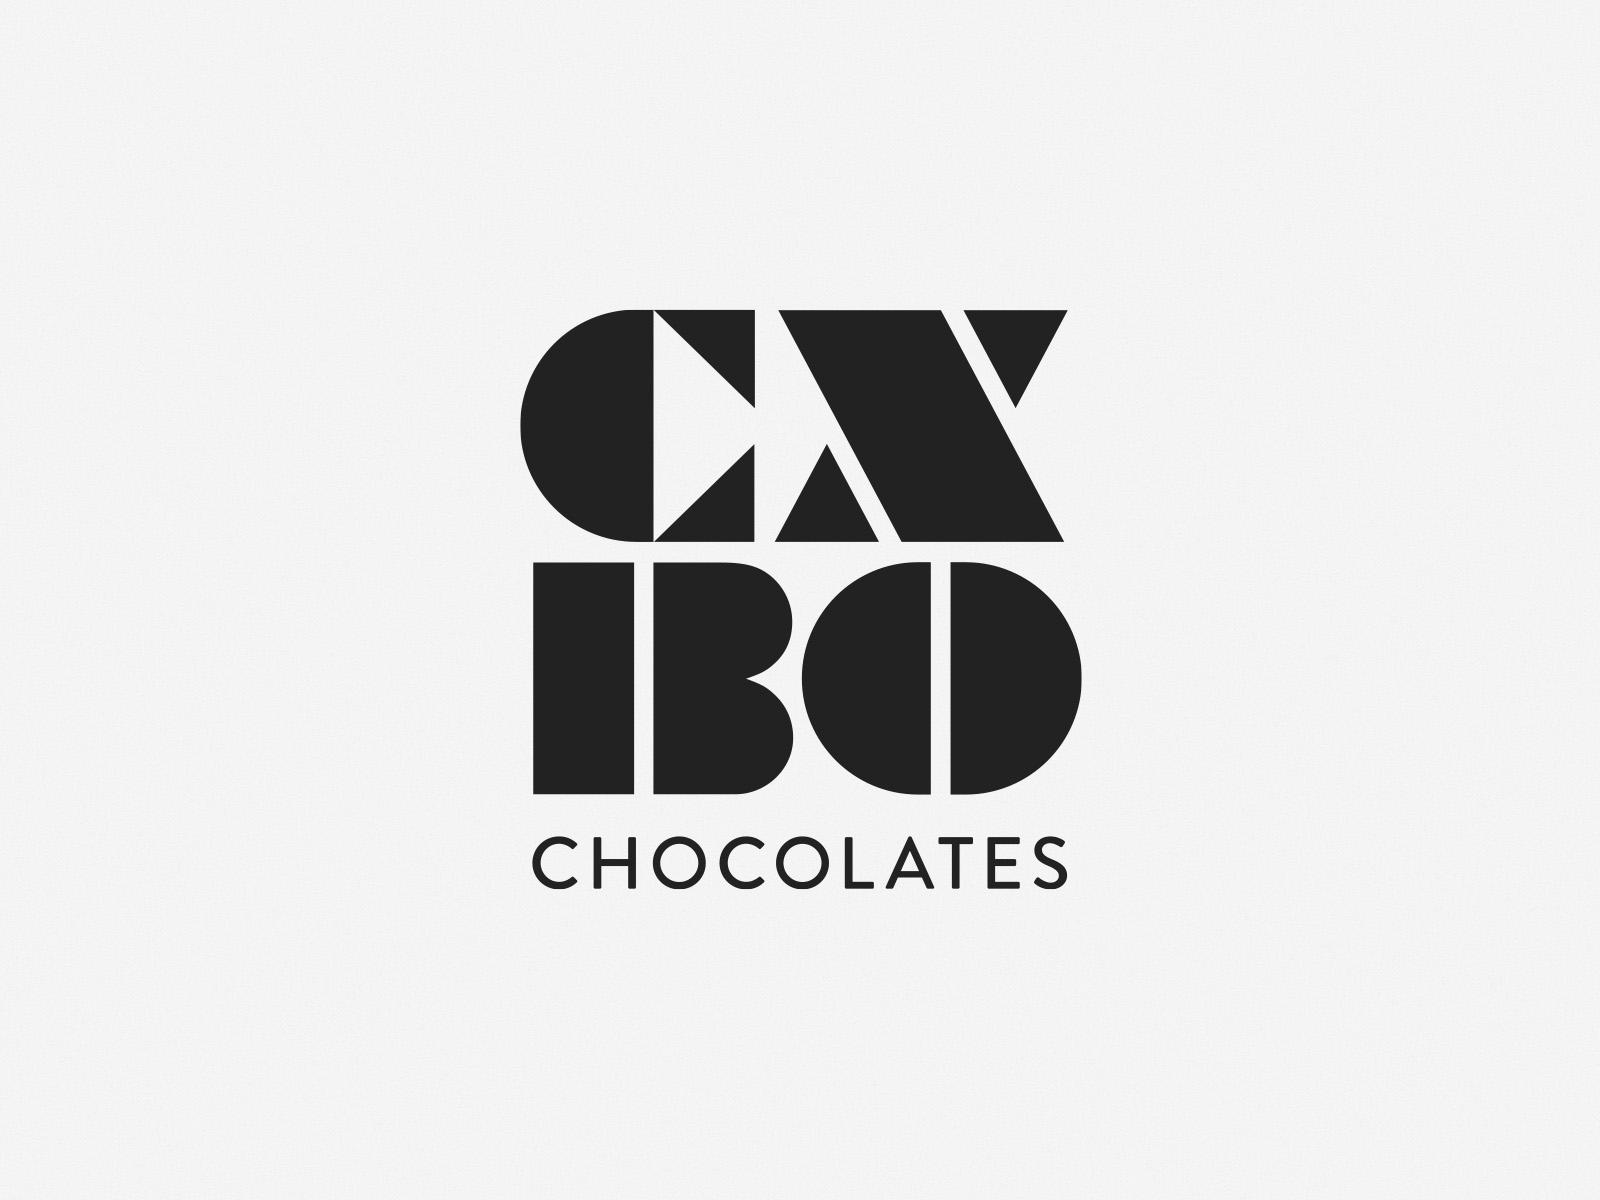 CXBO_NEW.jpg